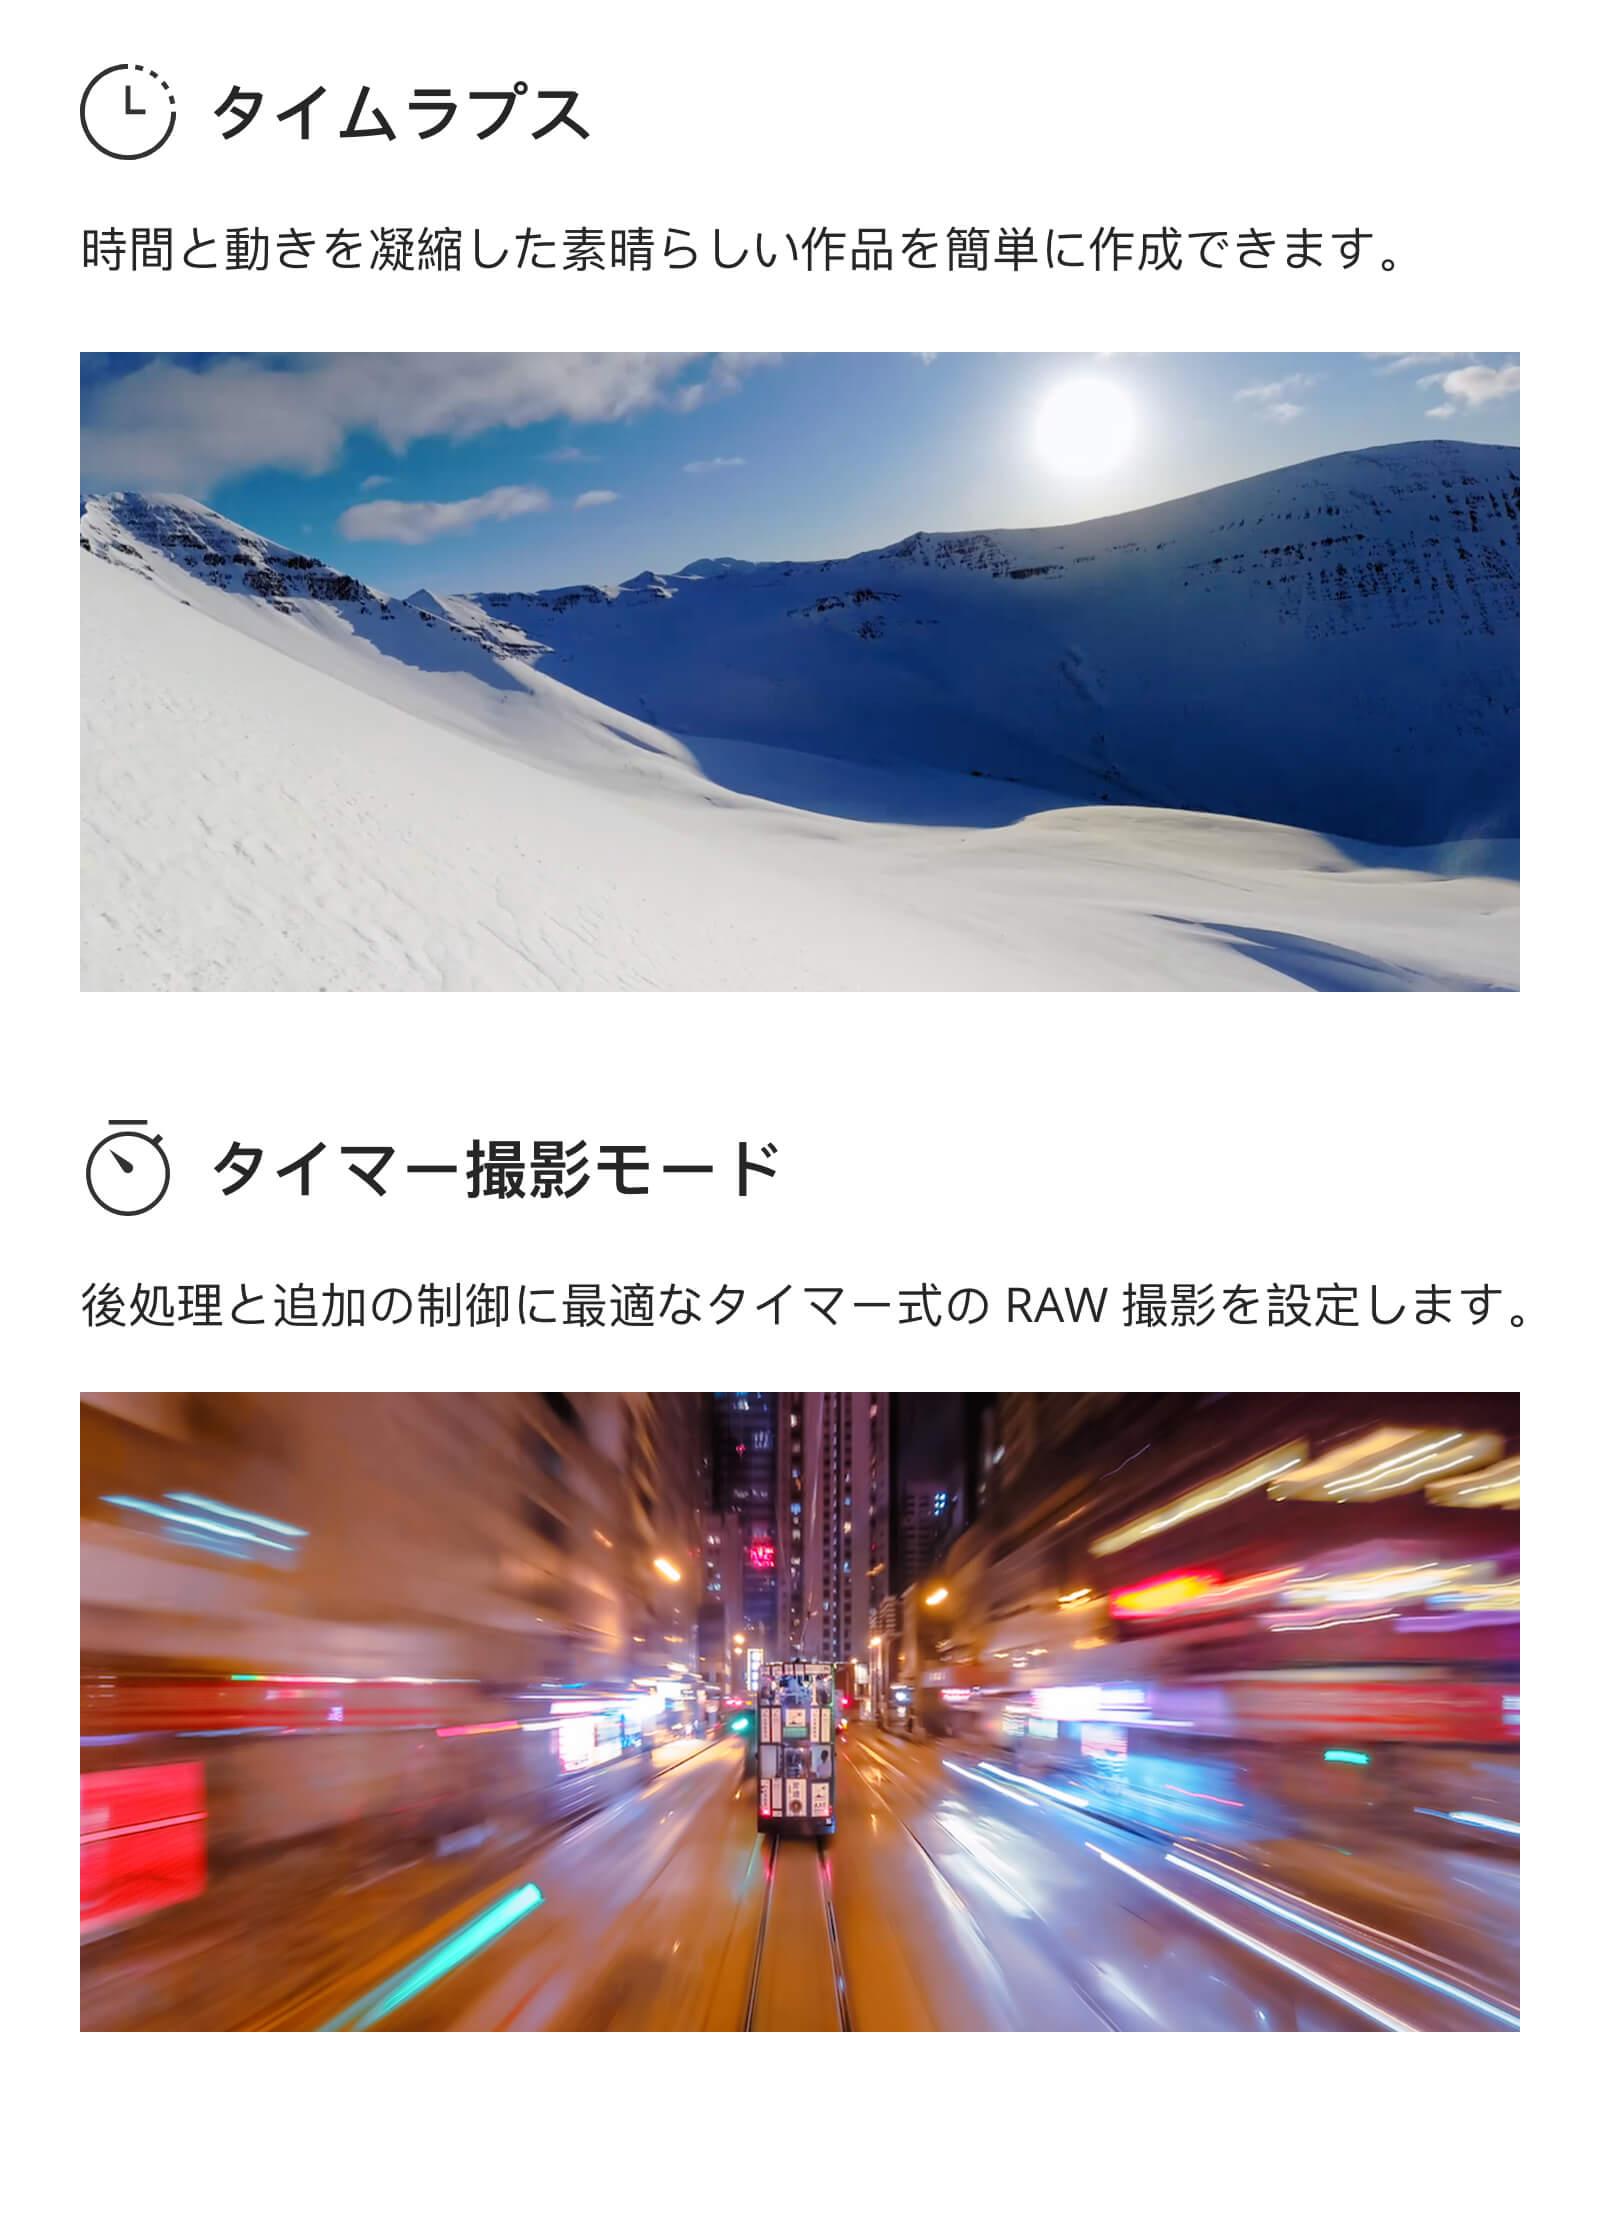 https://www.drone-station.net/images/DJI/osmoaction/08action.jpg